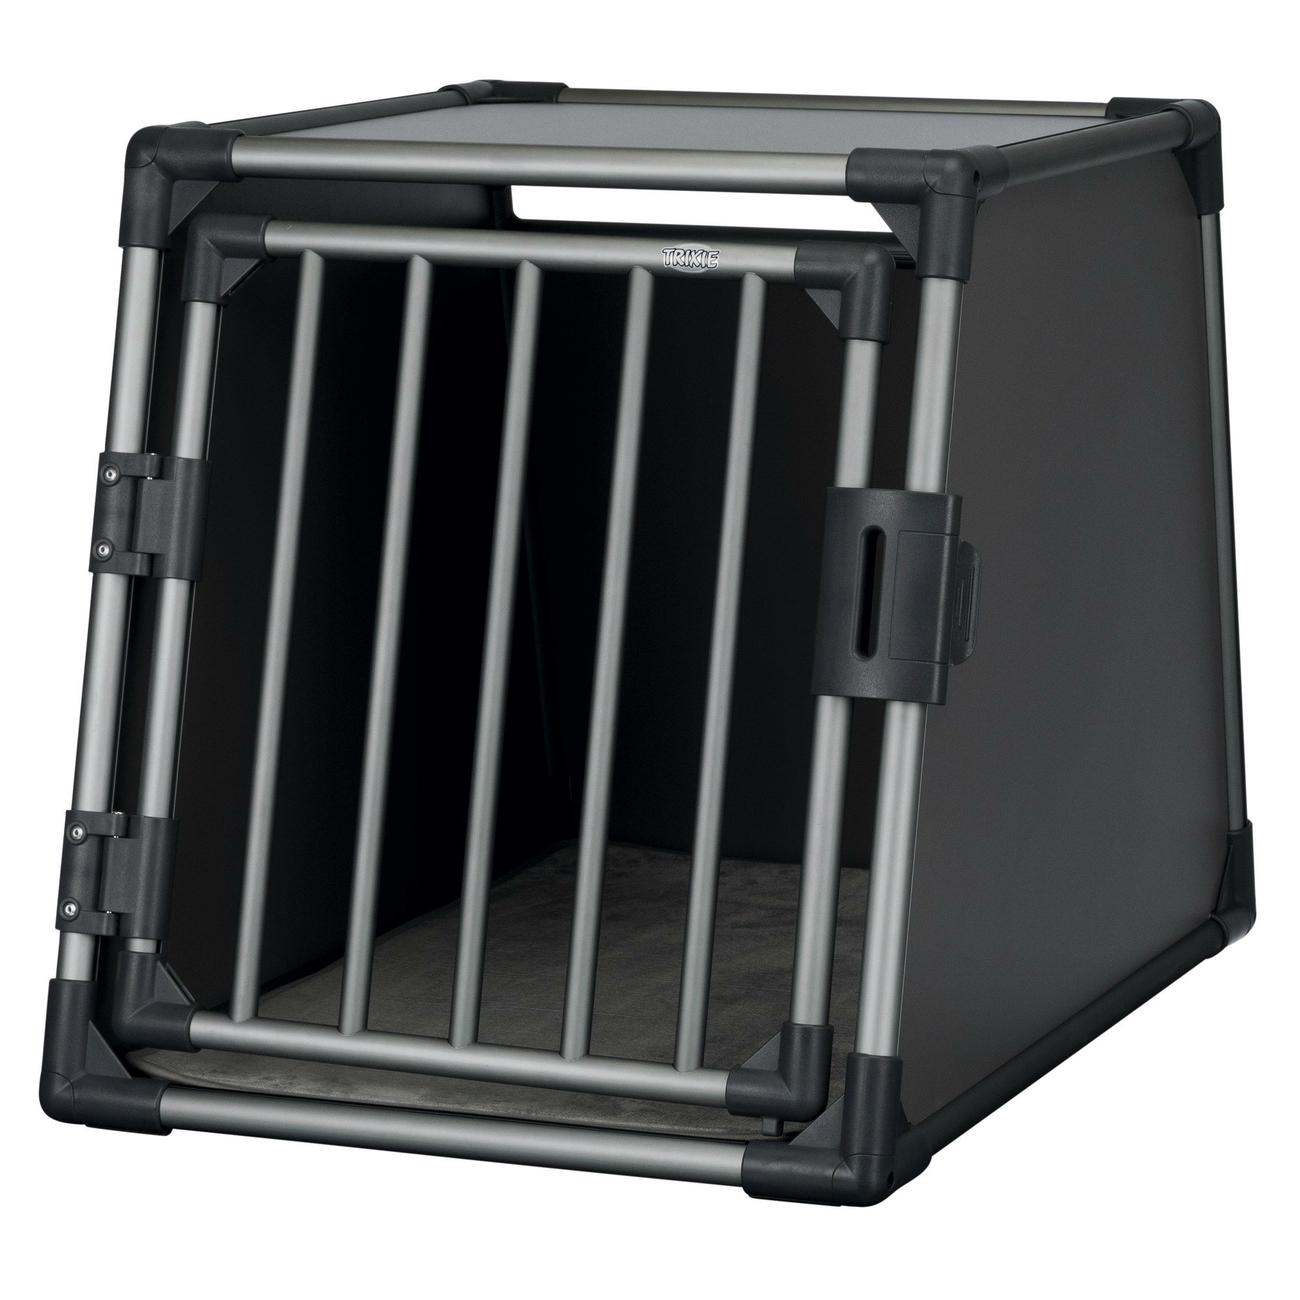 Trixie Autobox für Hunde aus Aluminium, graphit 39335, Bild 5